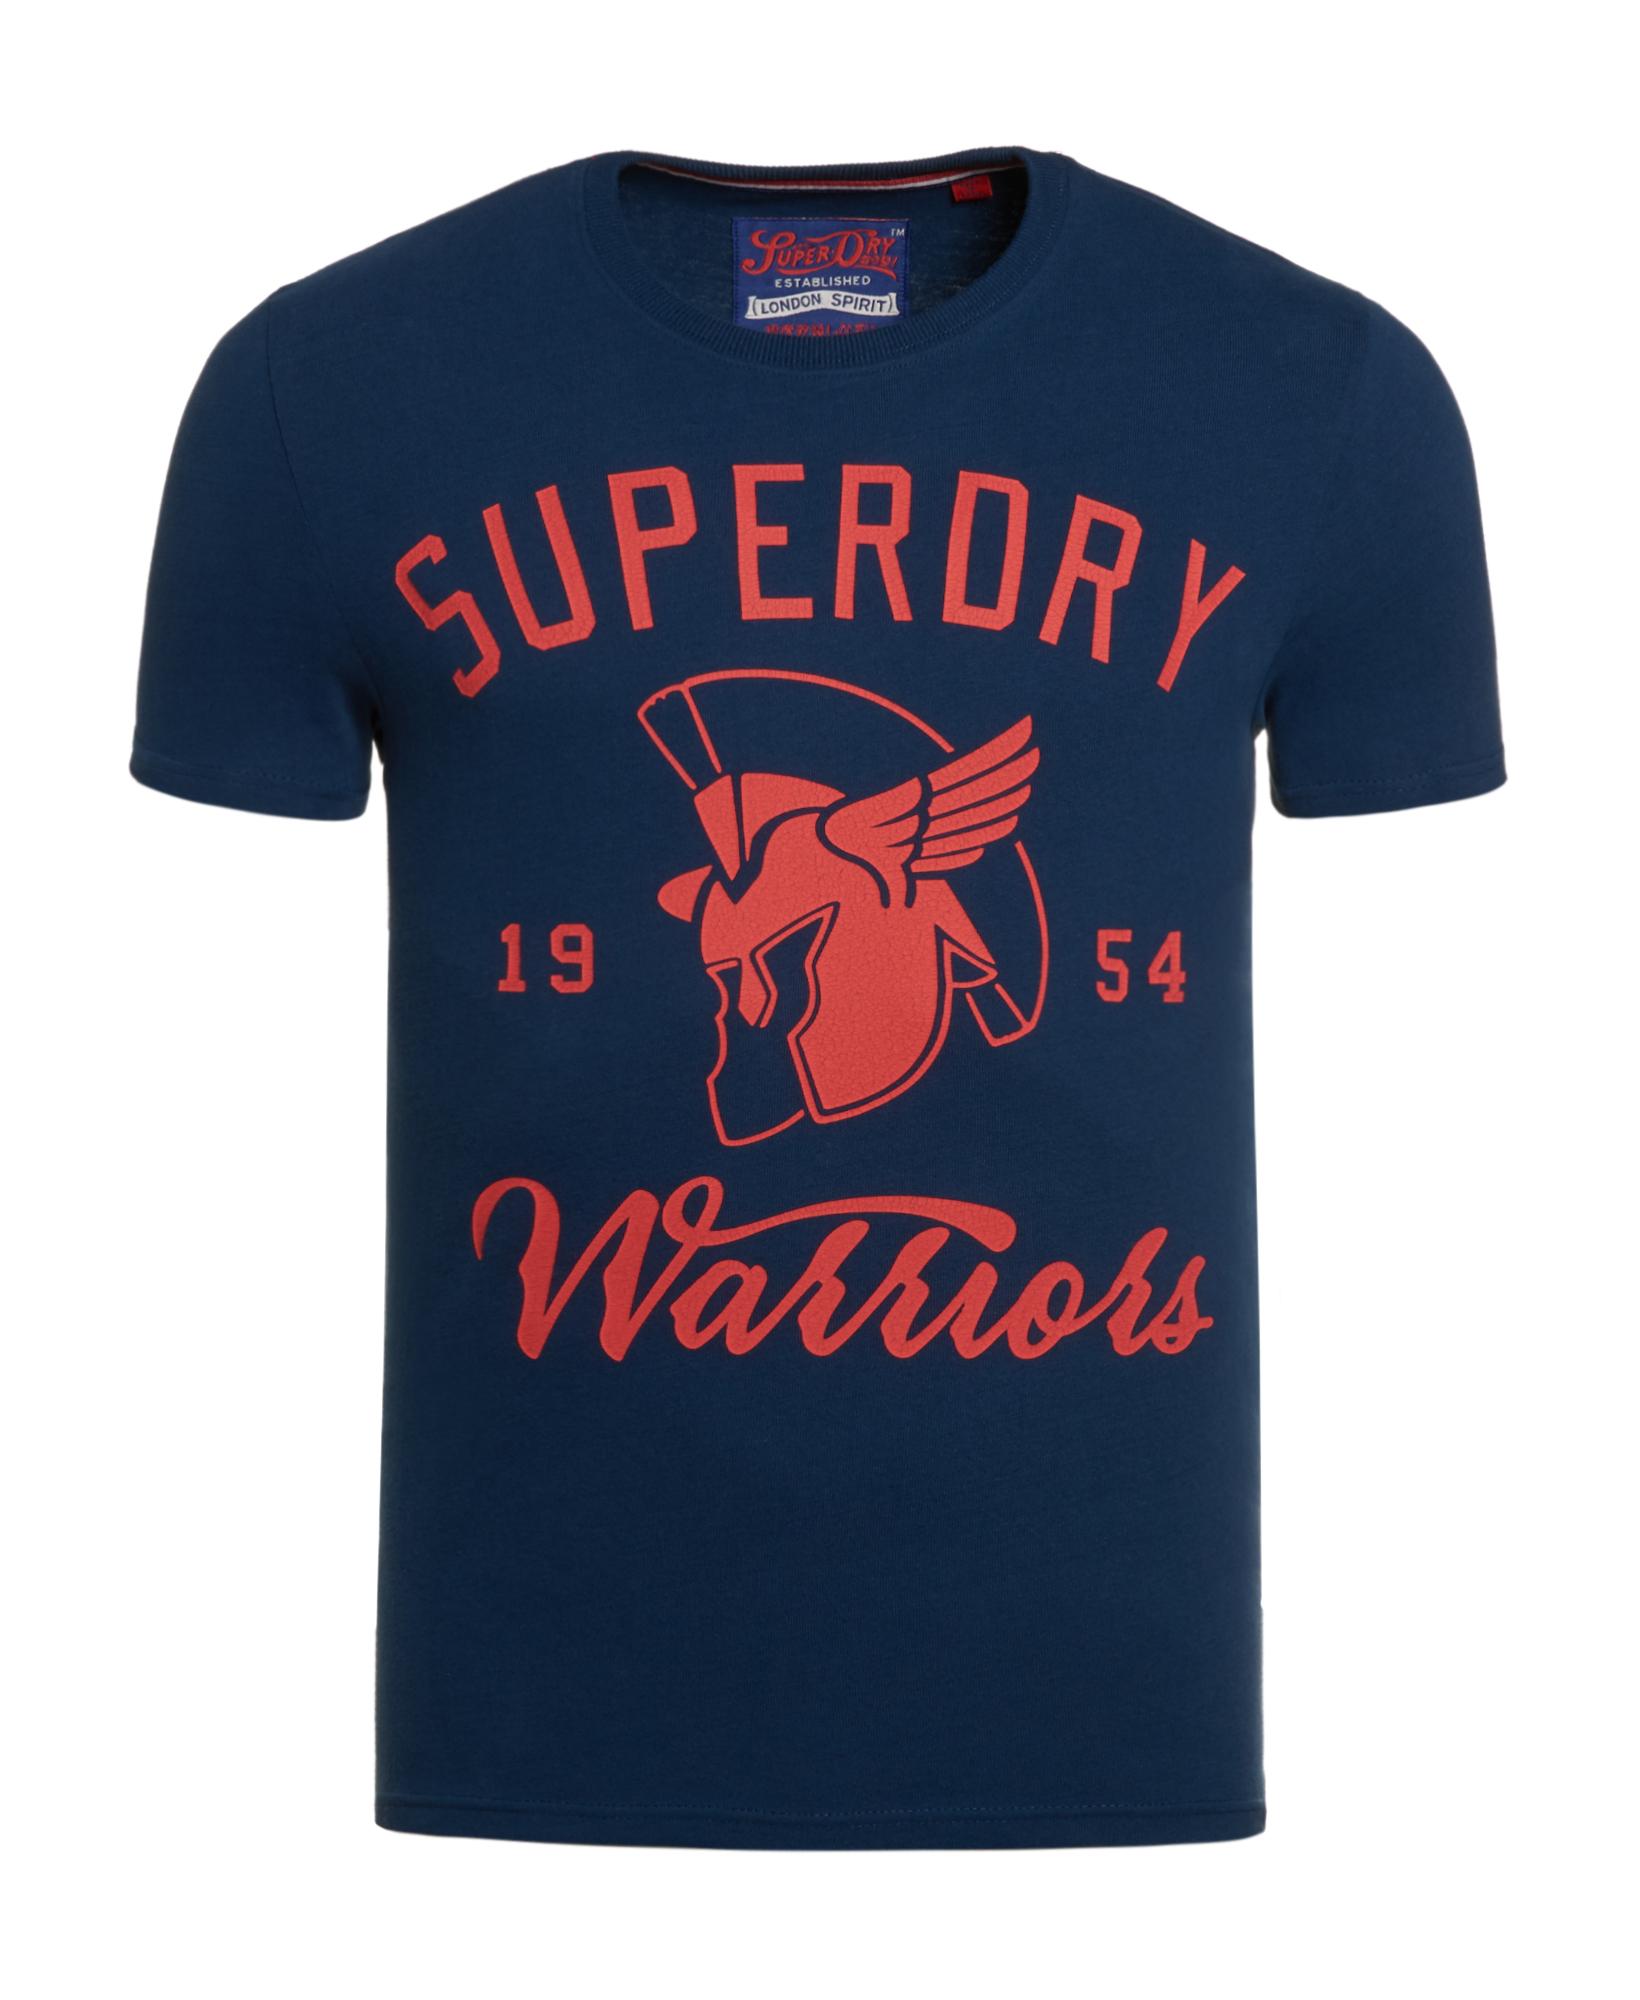 neues herren superdry gladiators t shirt boston blau ebay. Black Bedroom Furniture Sets. Home Design Ideas